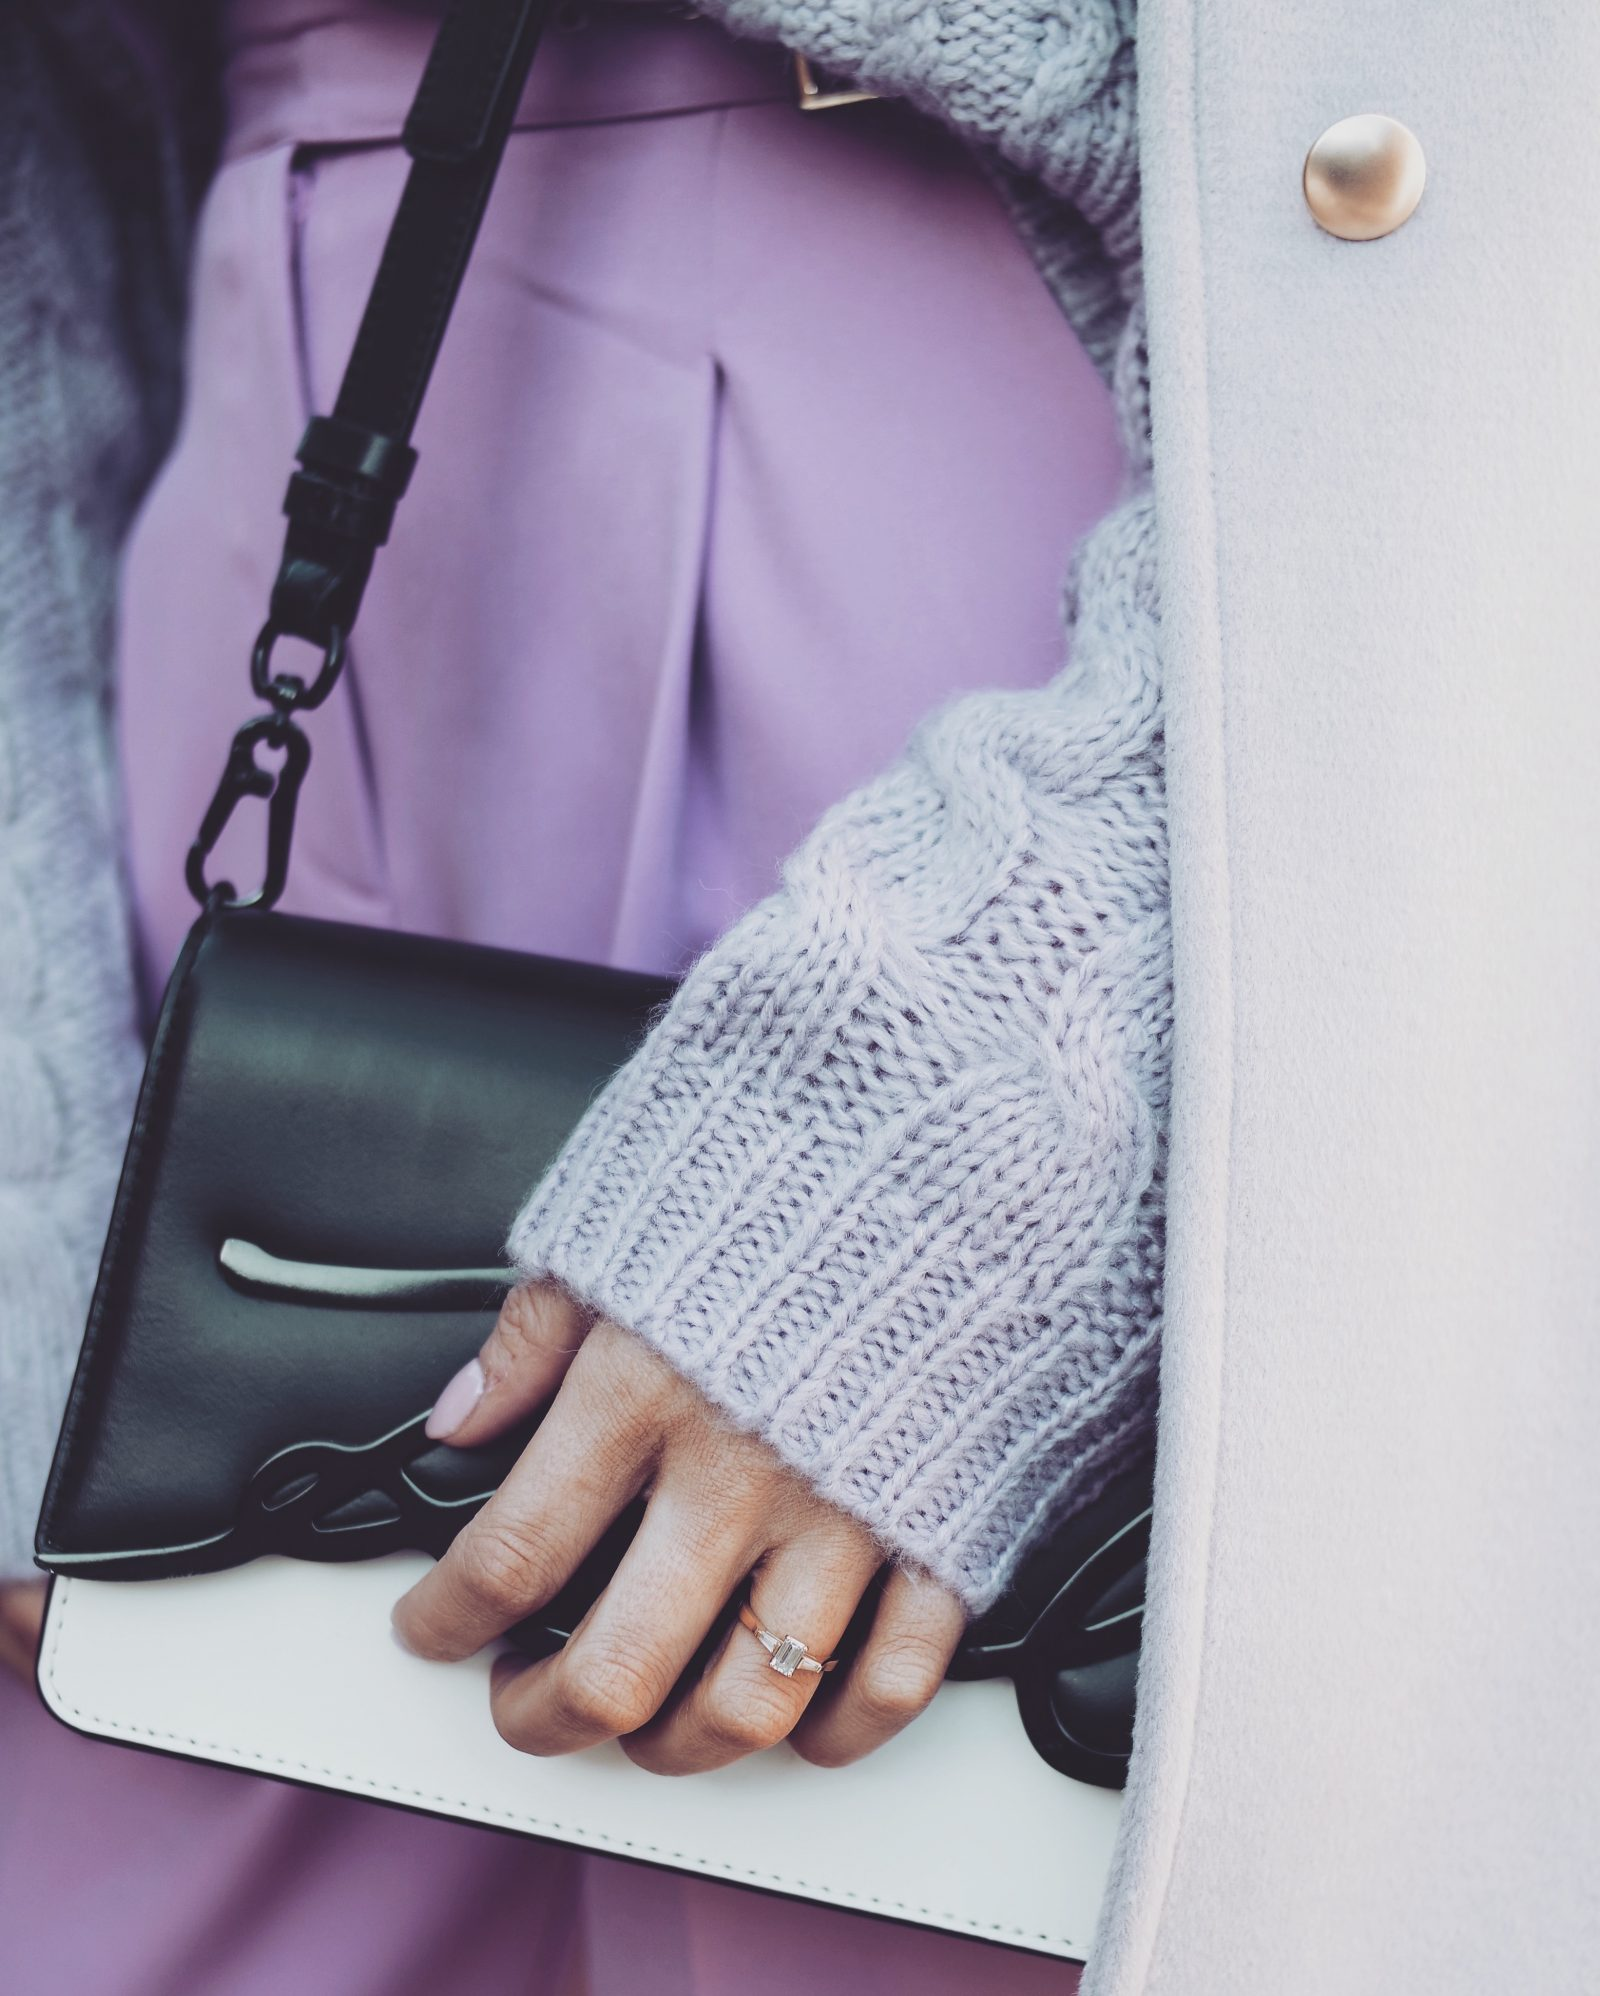 2018 Colour - Karl Lagerfeld Handbag